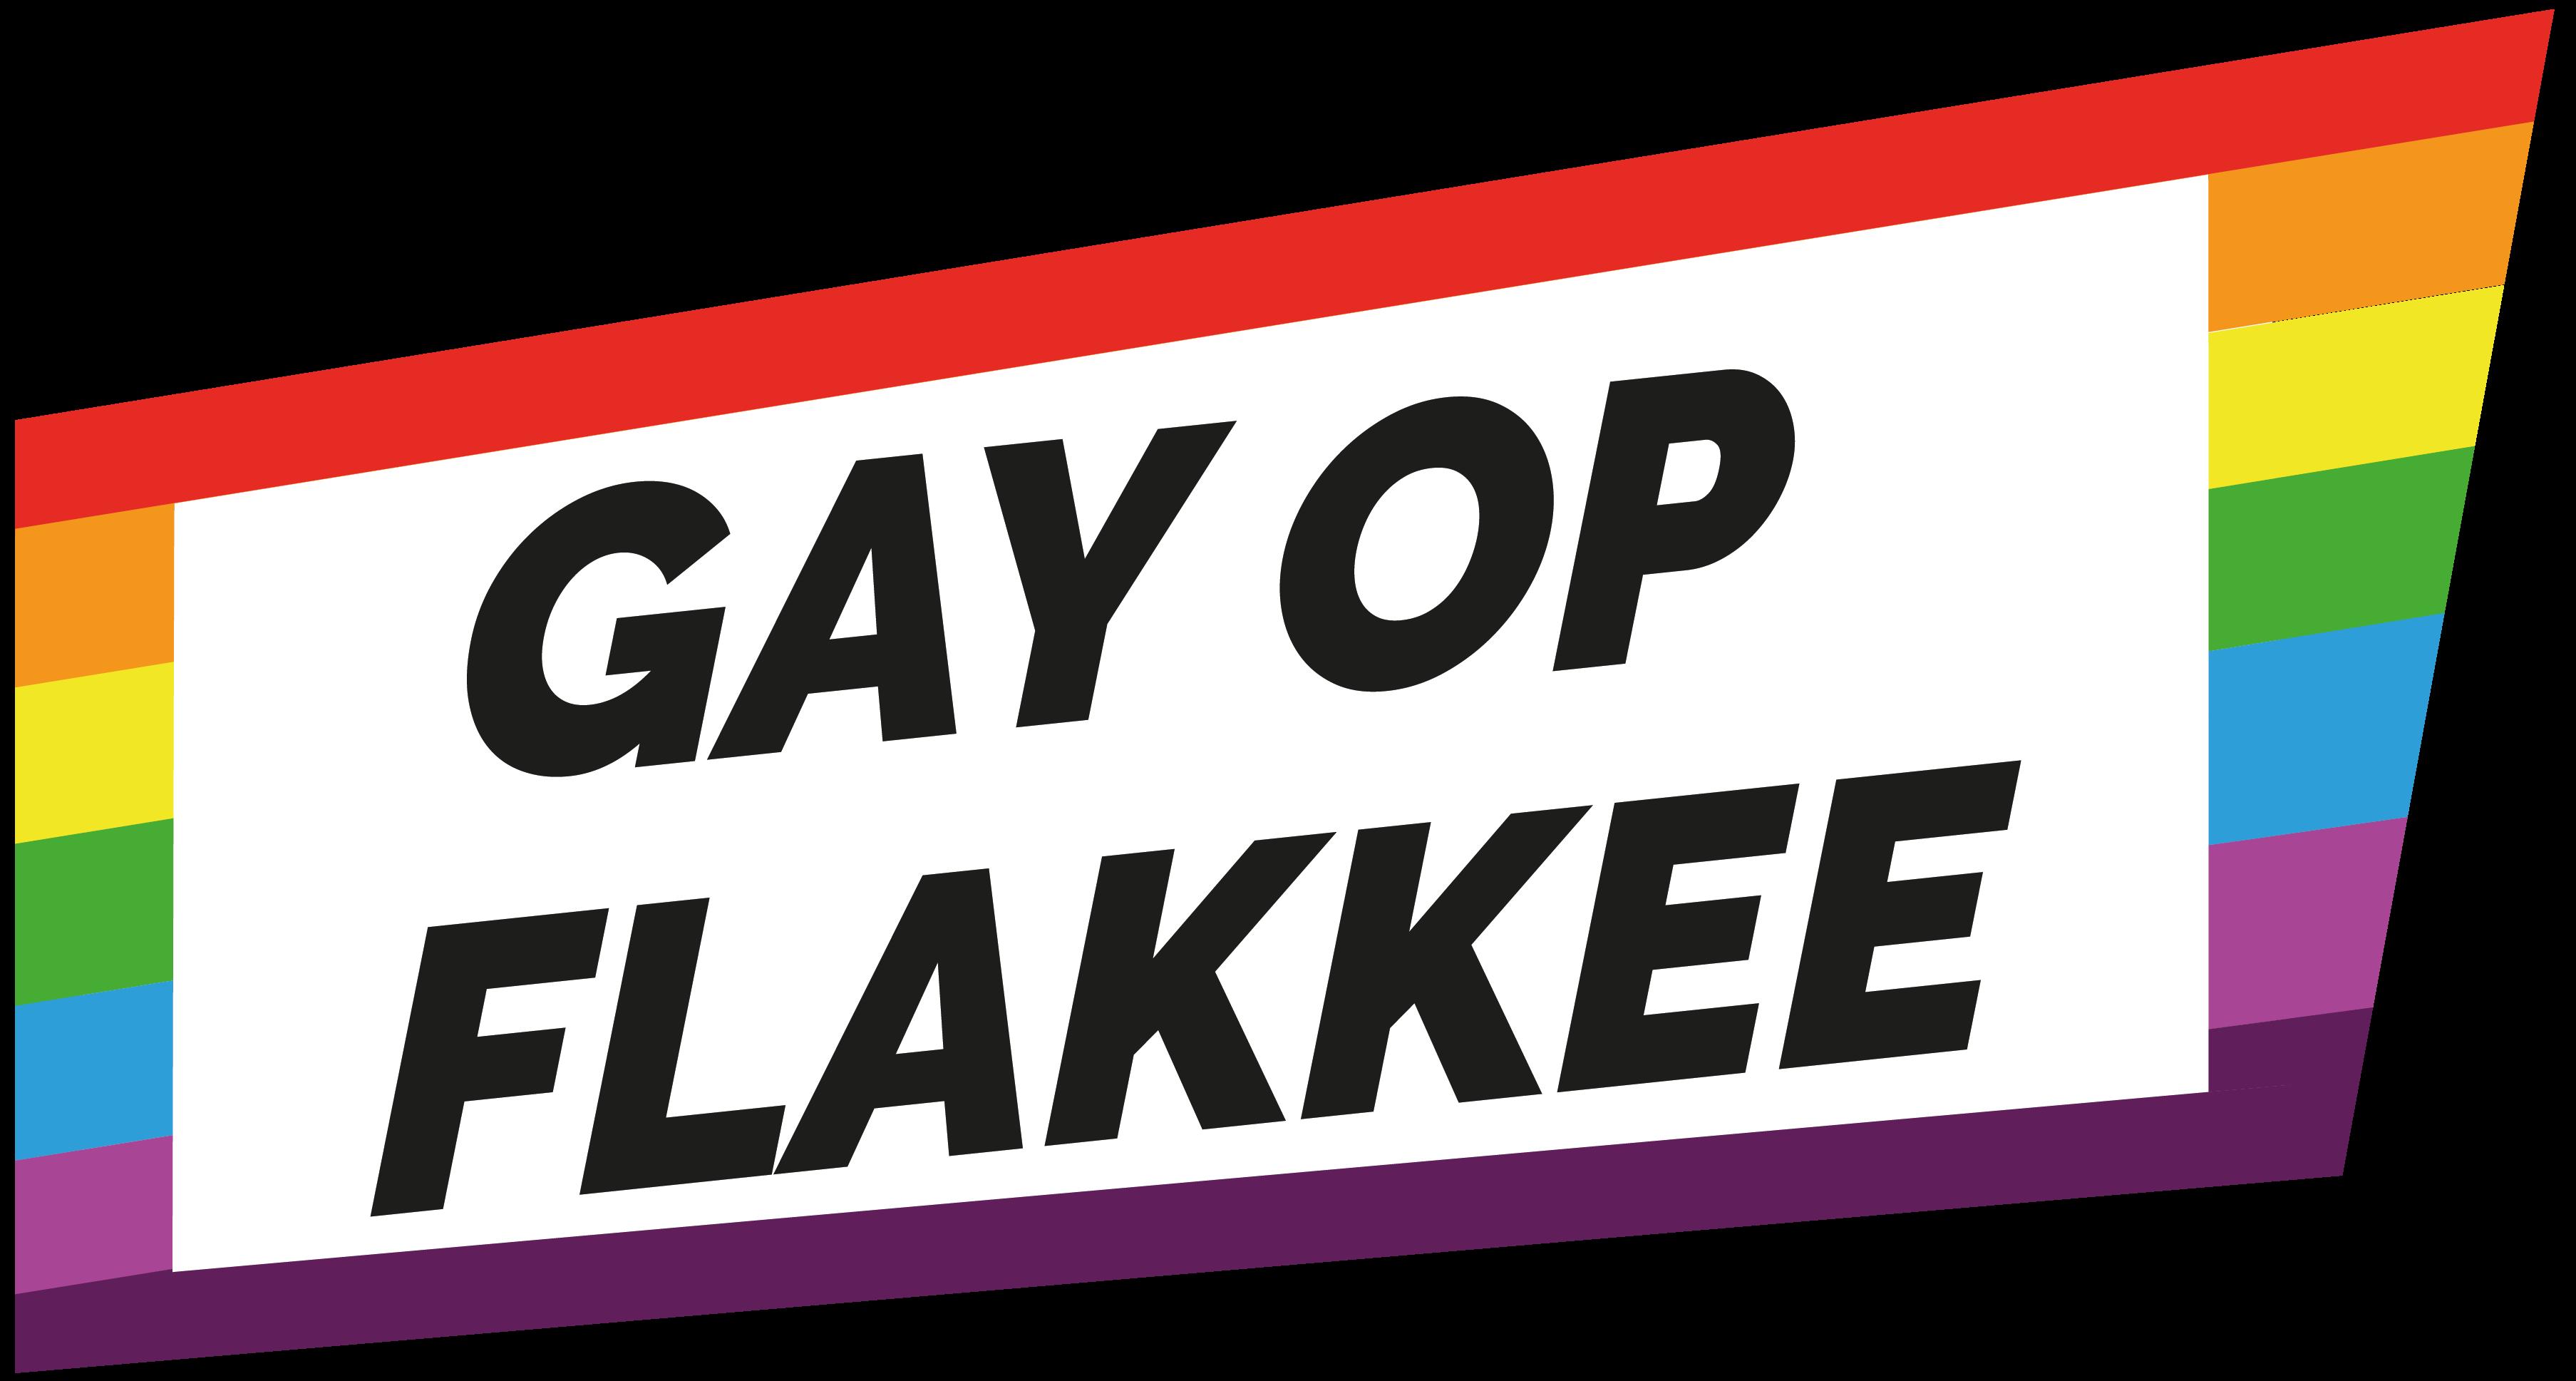 Gay op Flakkee